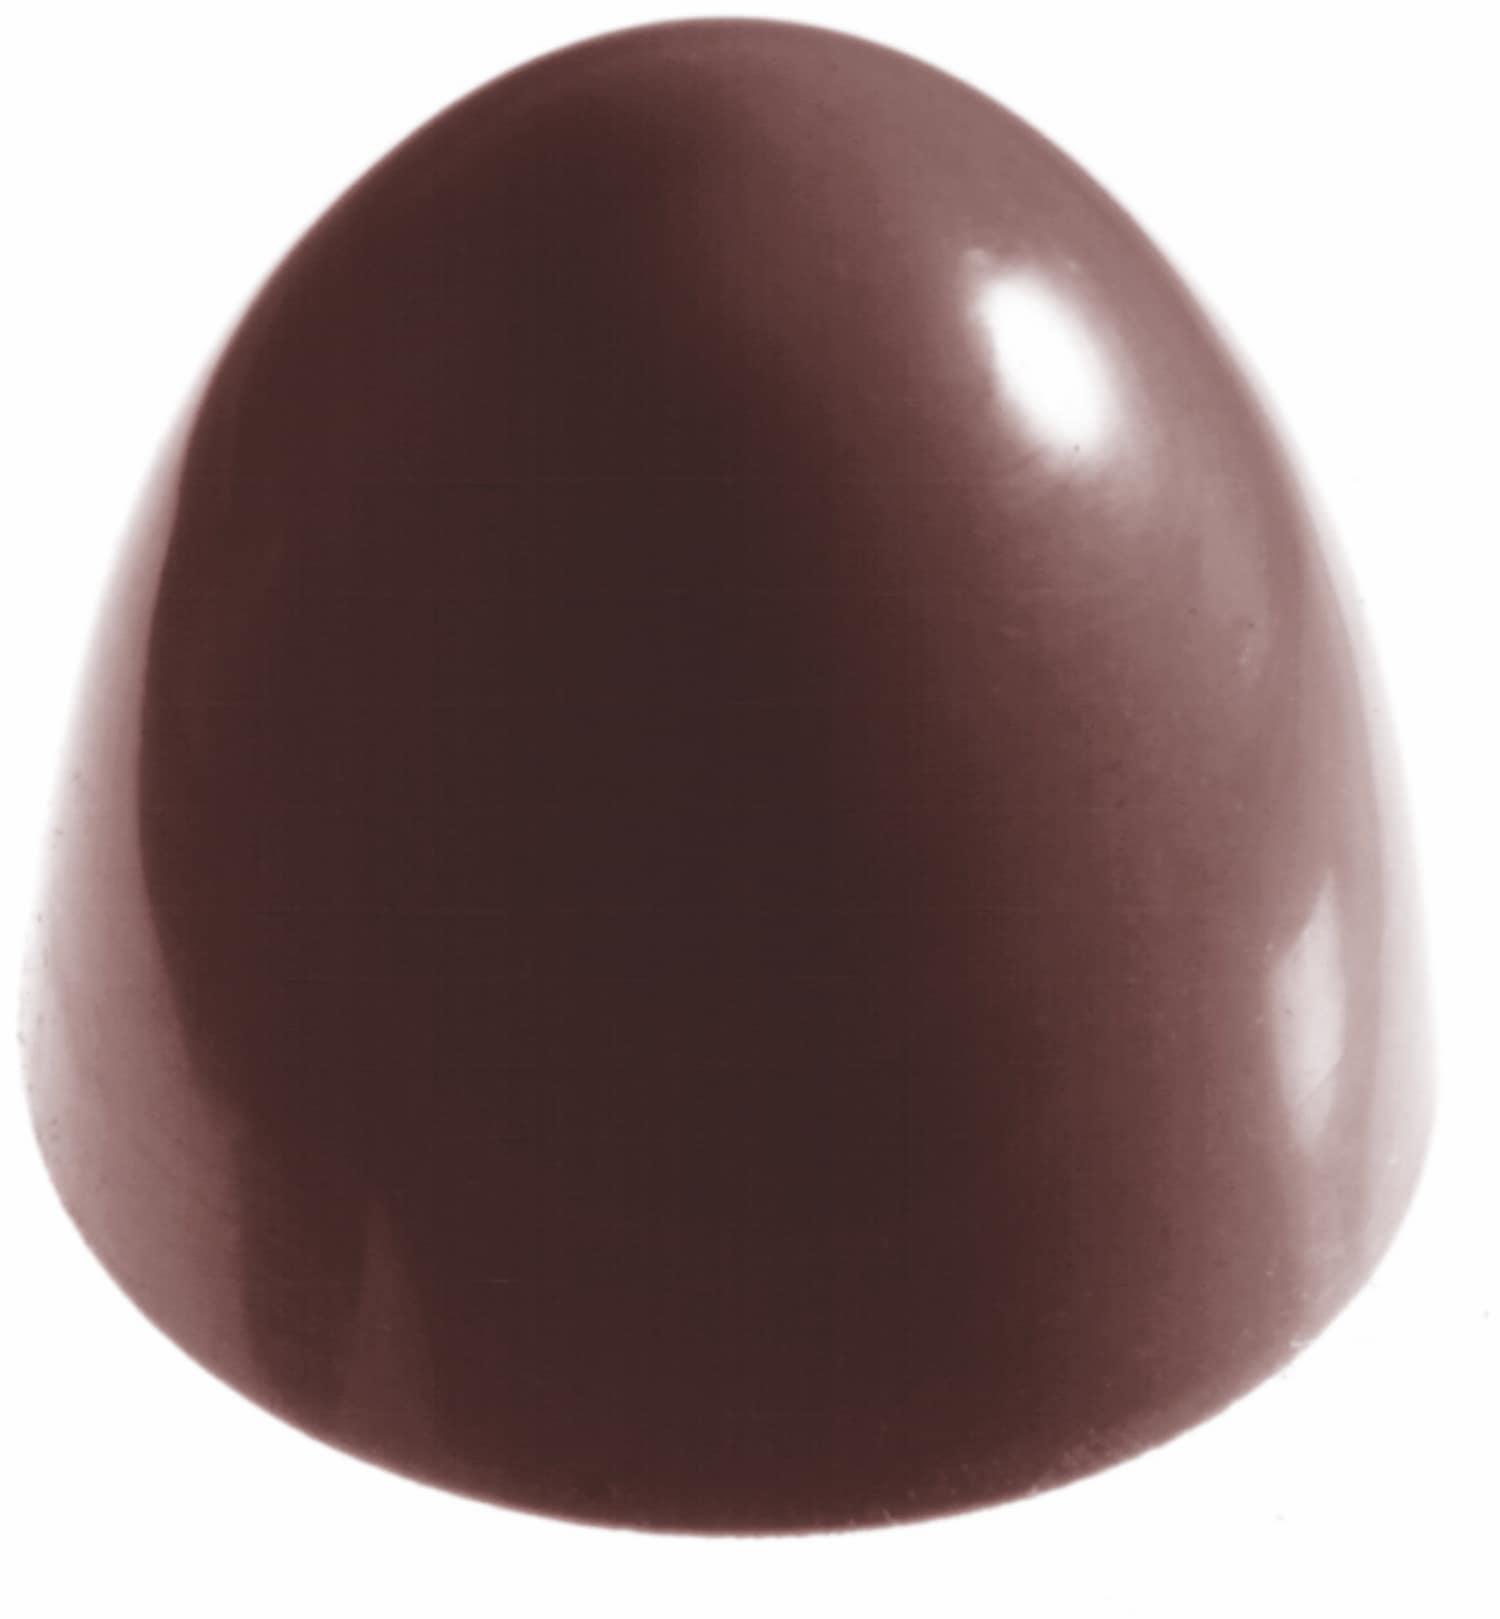 "Schokoladenform ""Kugel"" 421291"